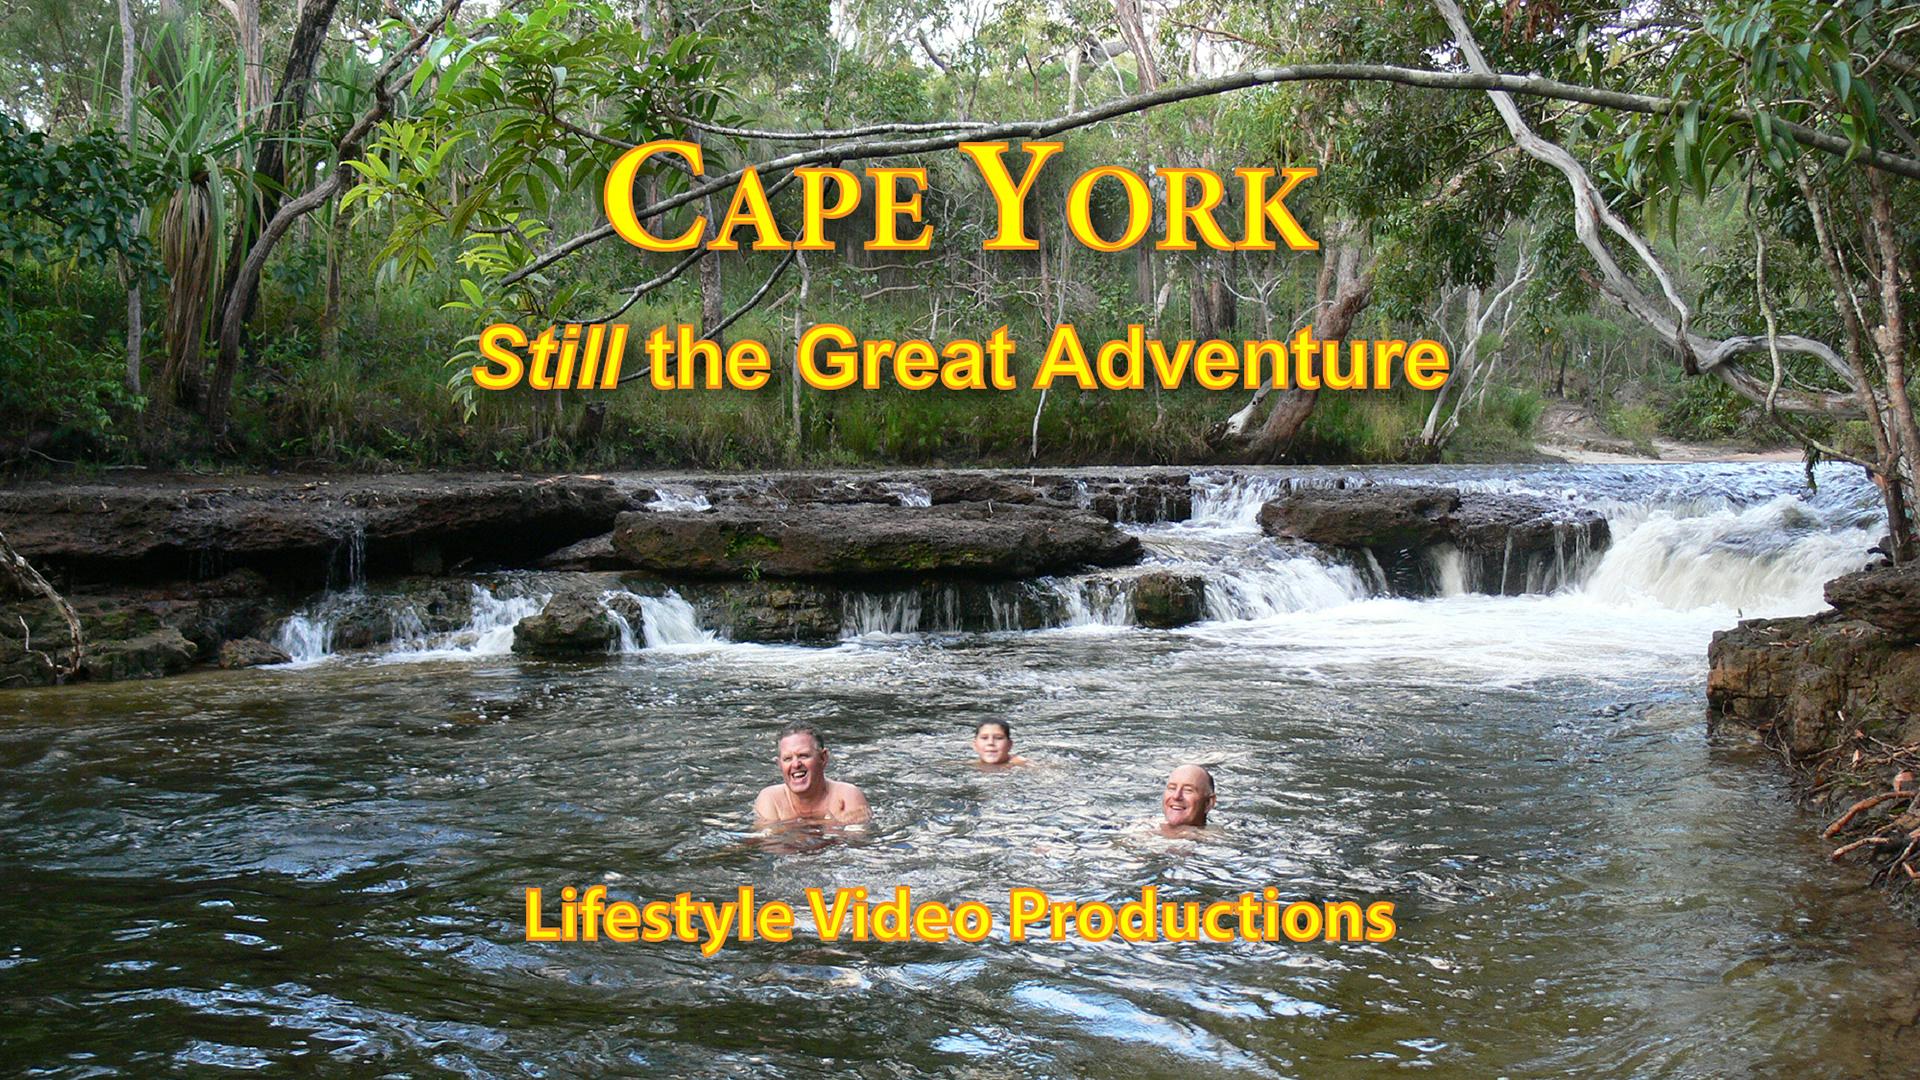 Cape York: Still the Great Adventure